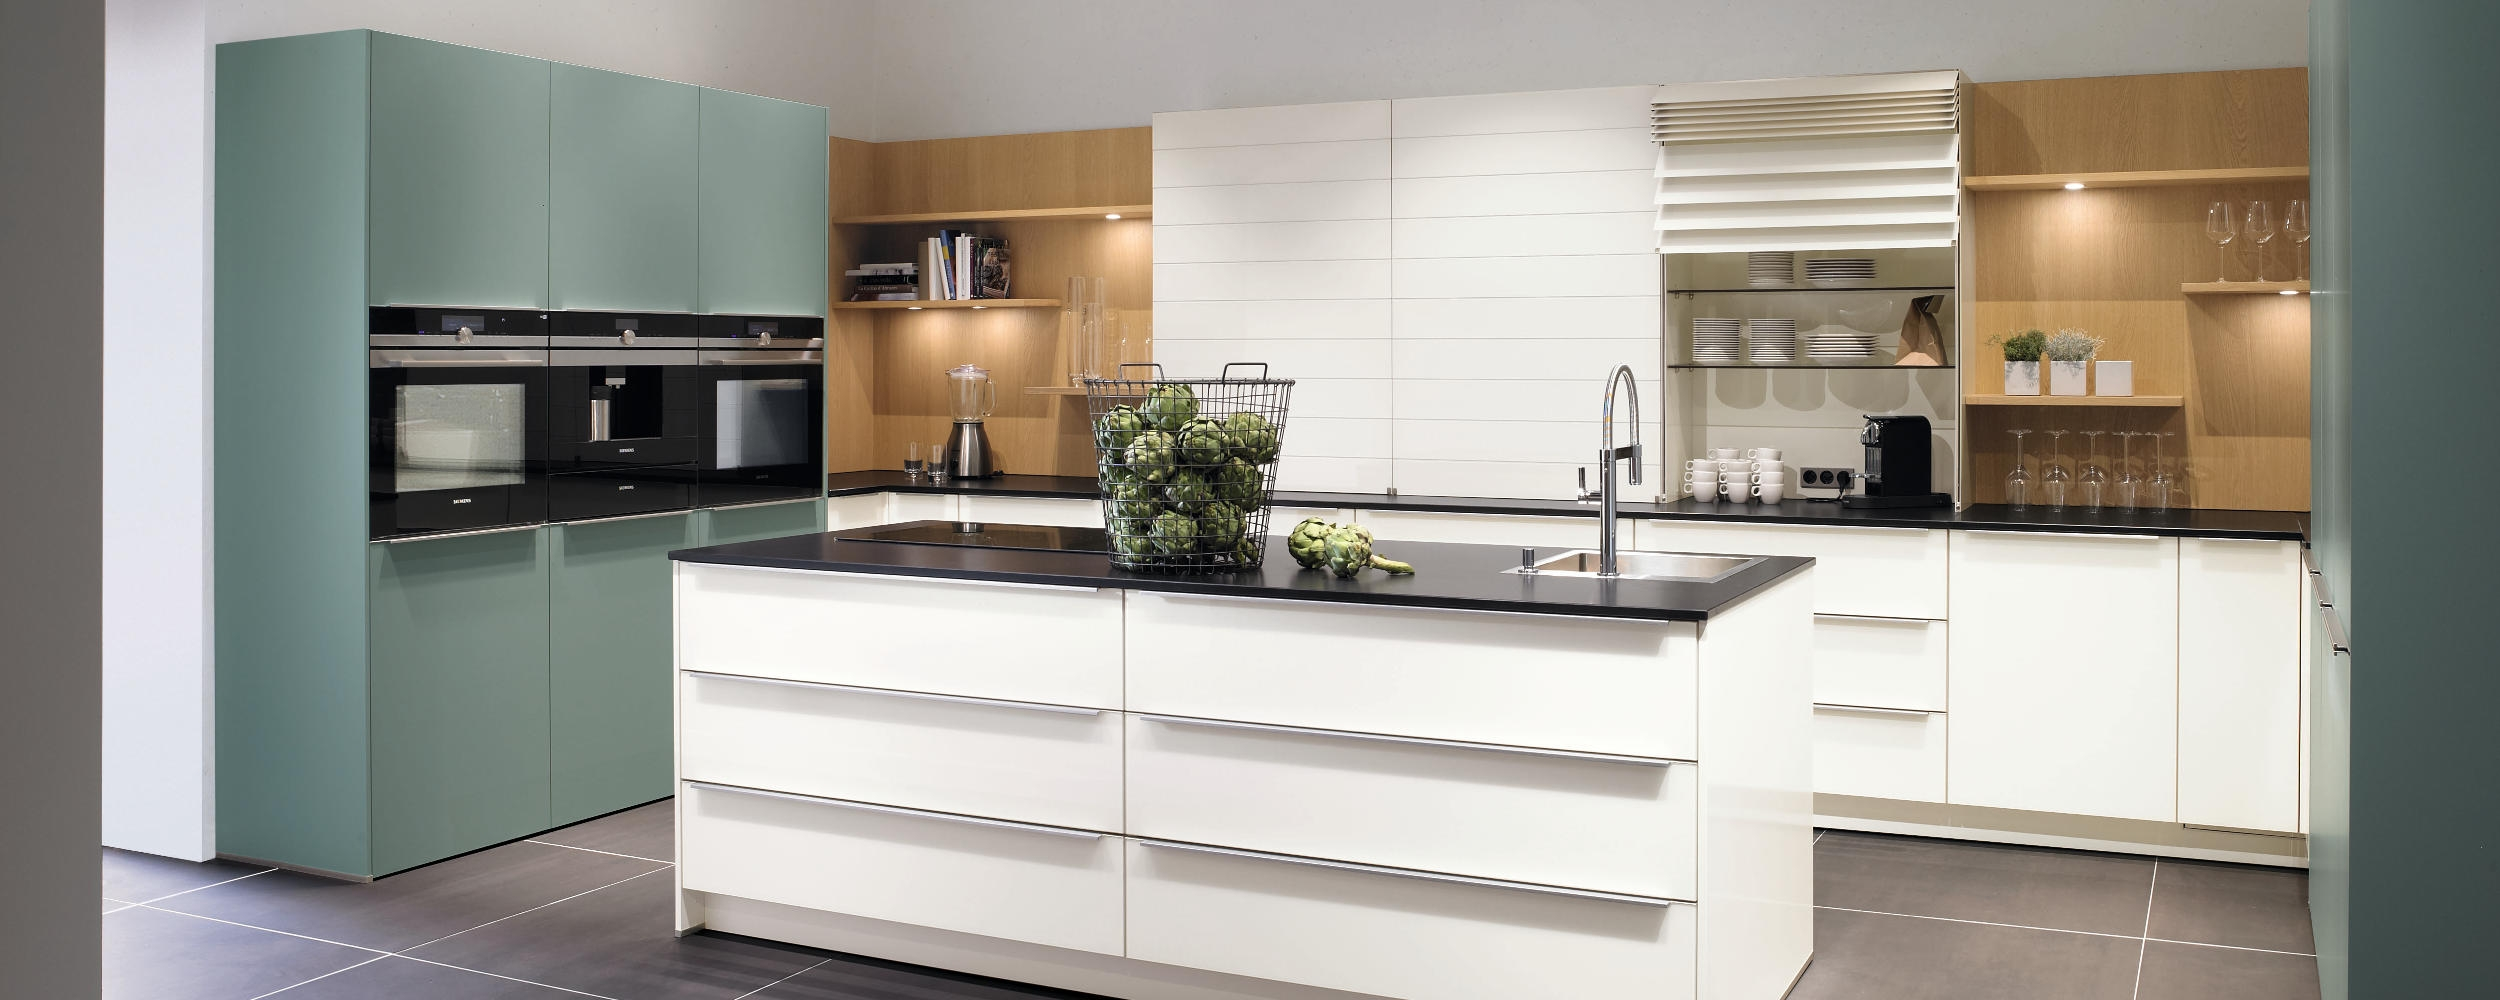 pronorm proline kitchen edinburgh